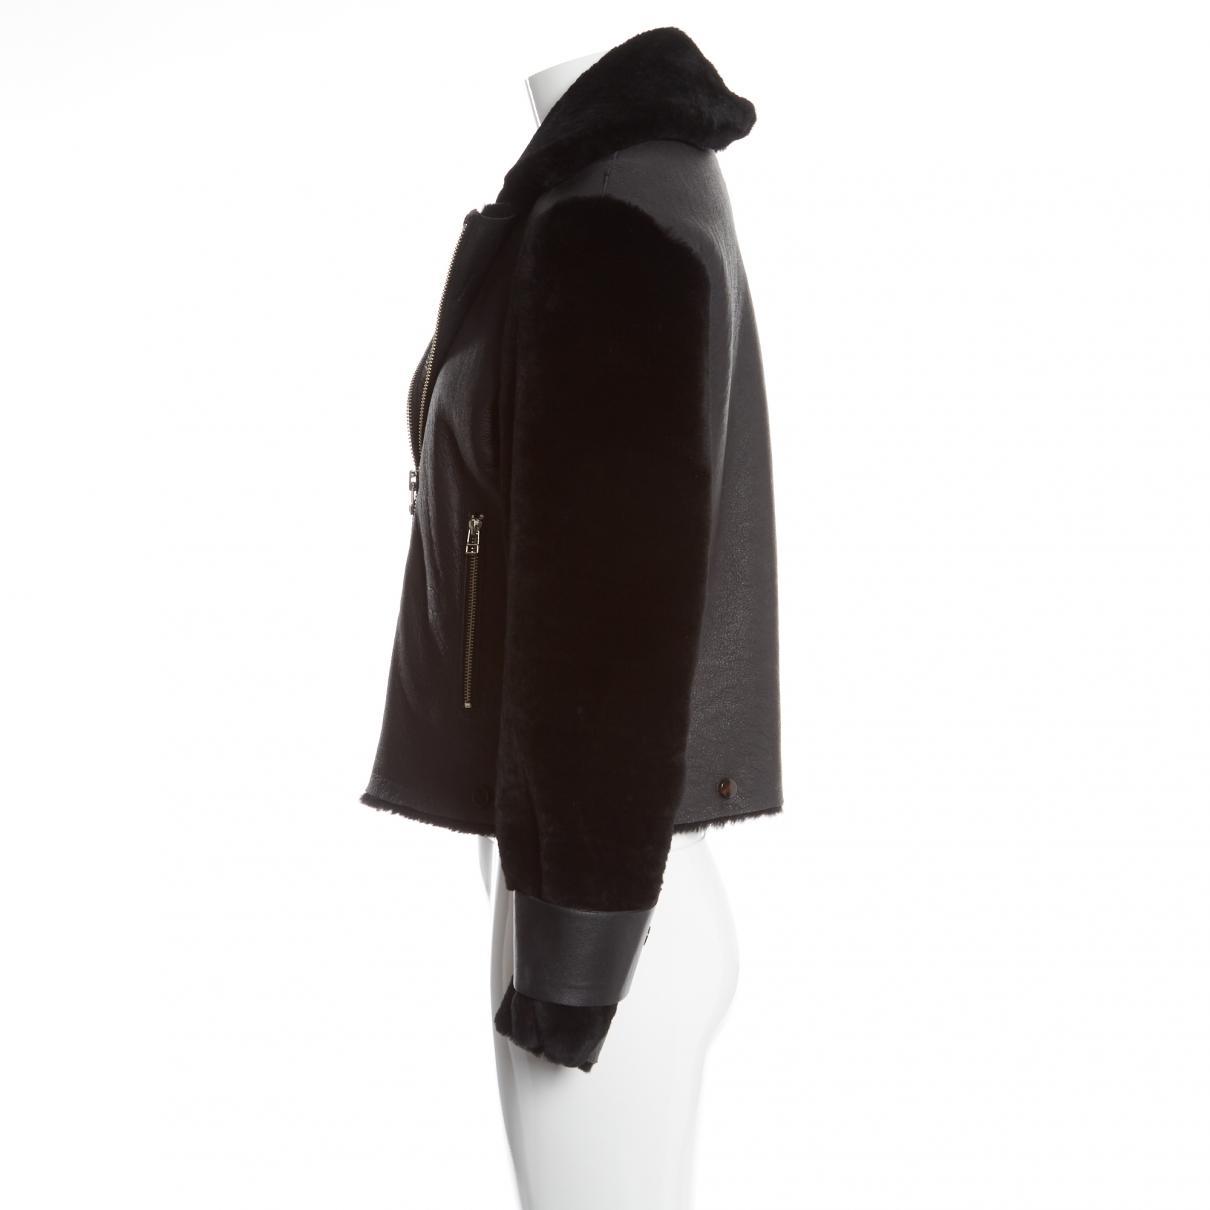 e177417e152 By Malene Birger Pre-owned Black Shearling Jackets in Black - Lyst